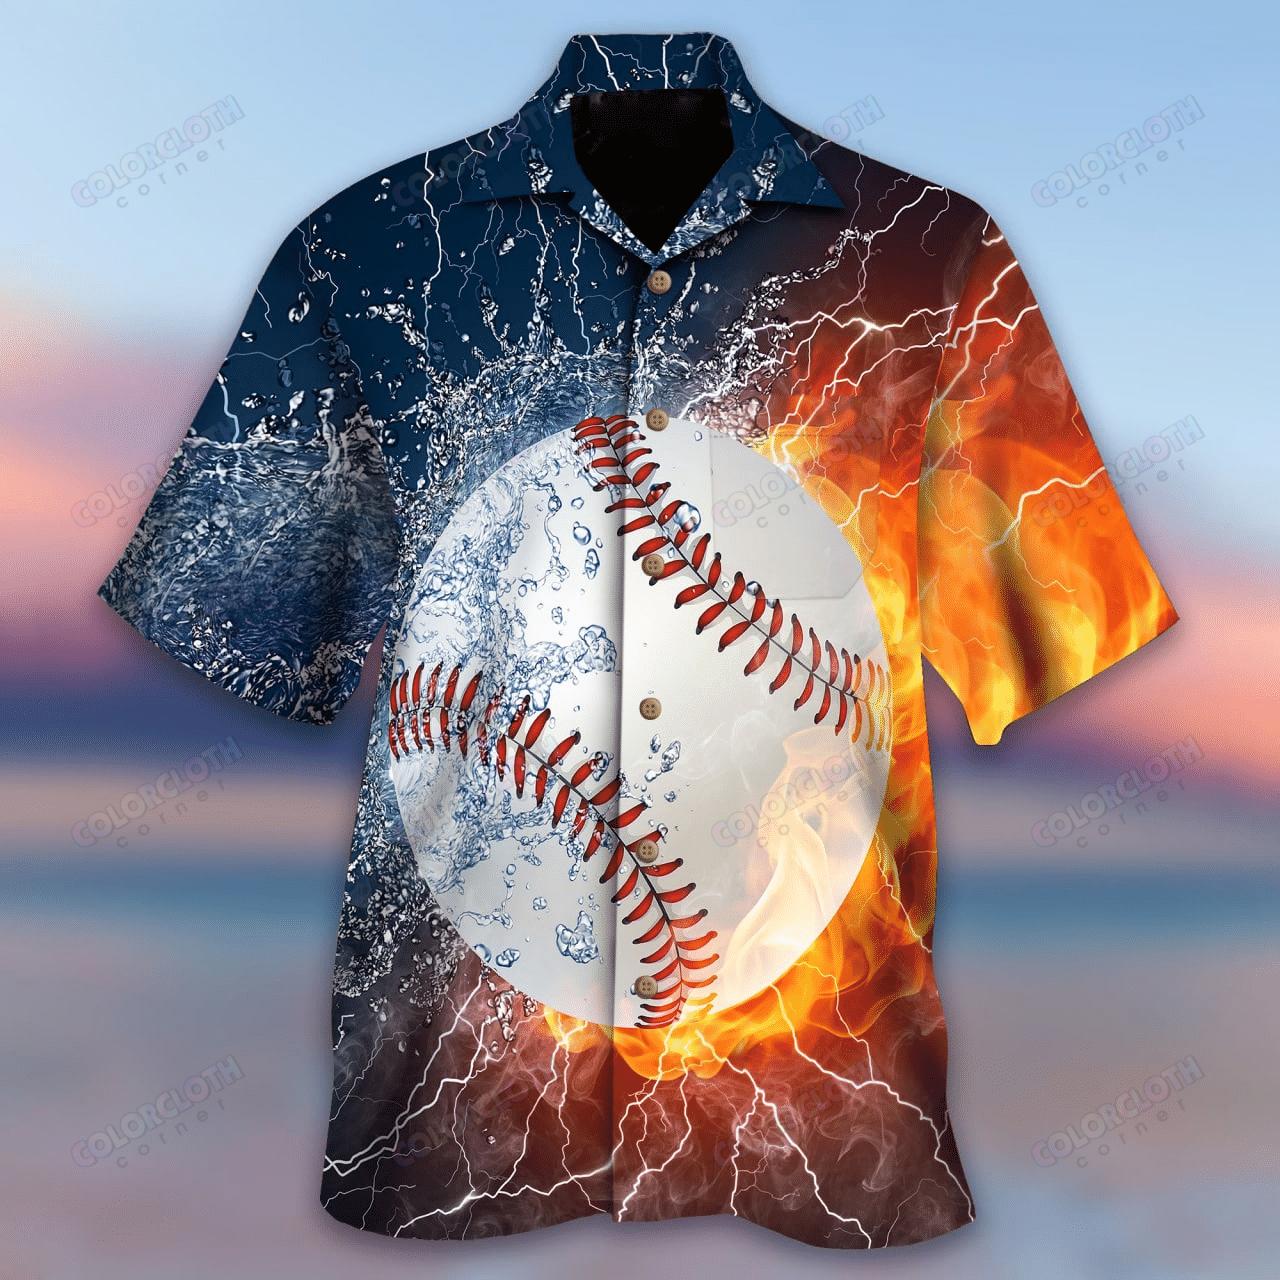 Baseball In My Heart Fire and Water Hawaiian Shirt